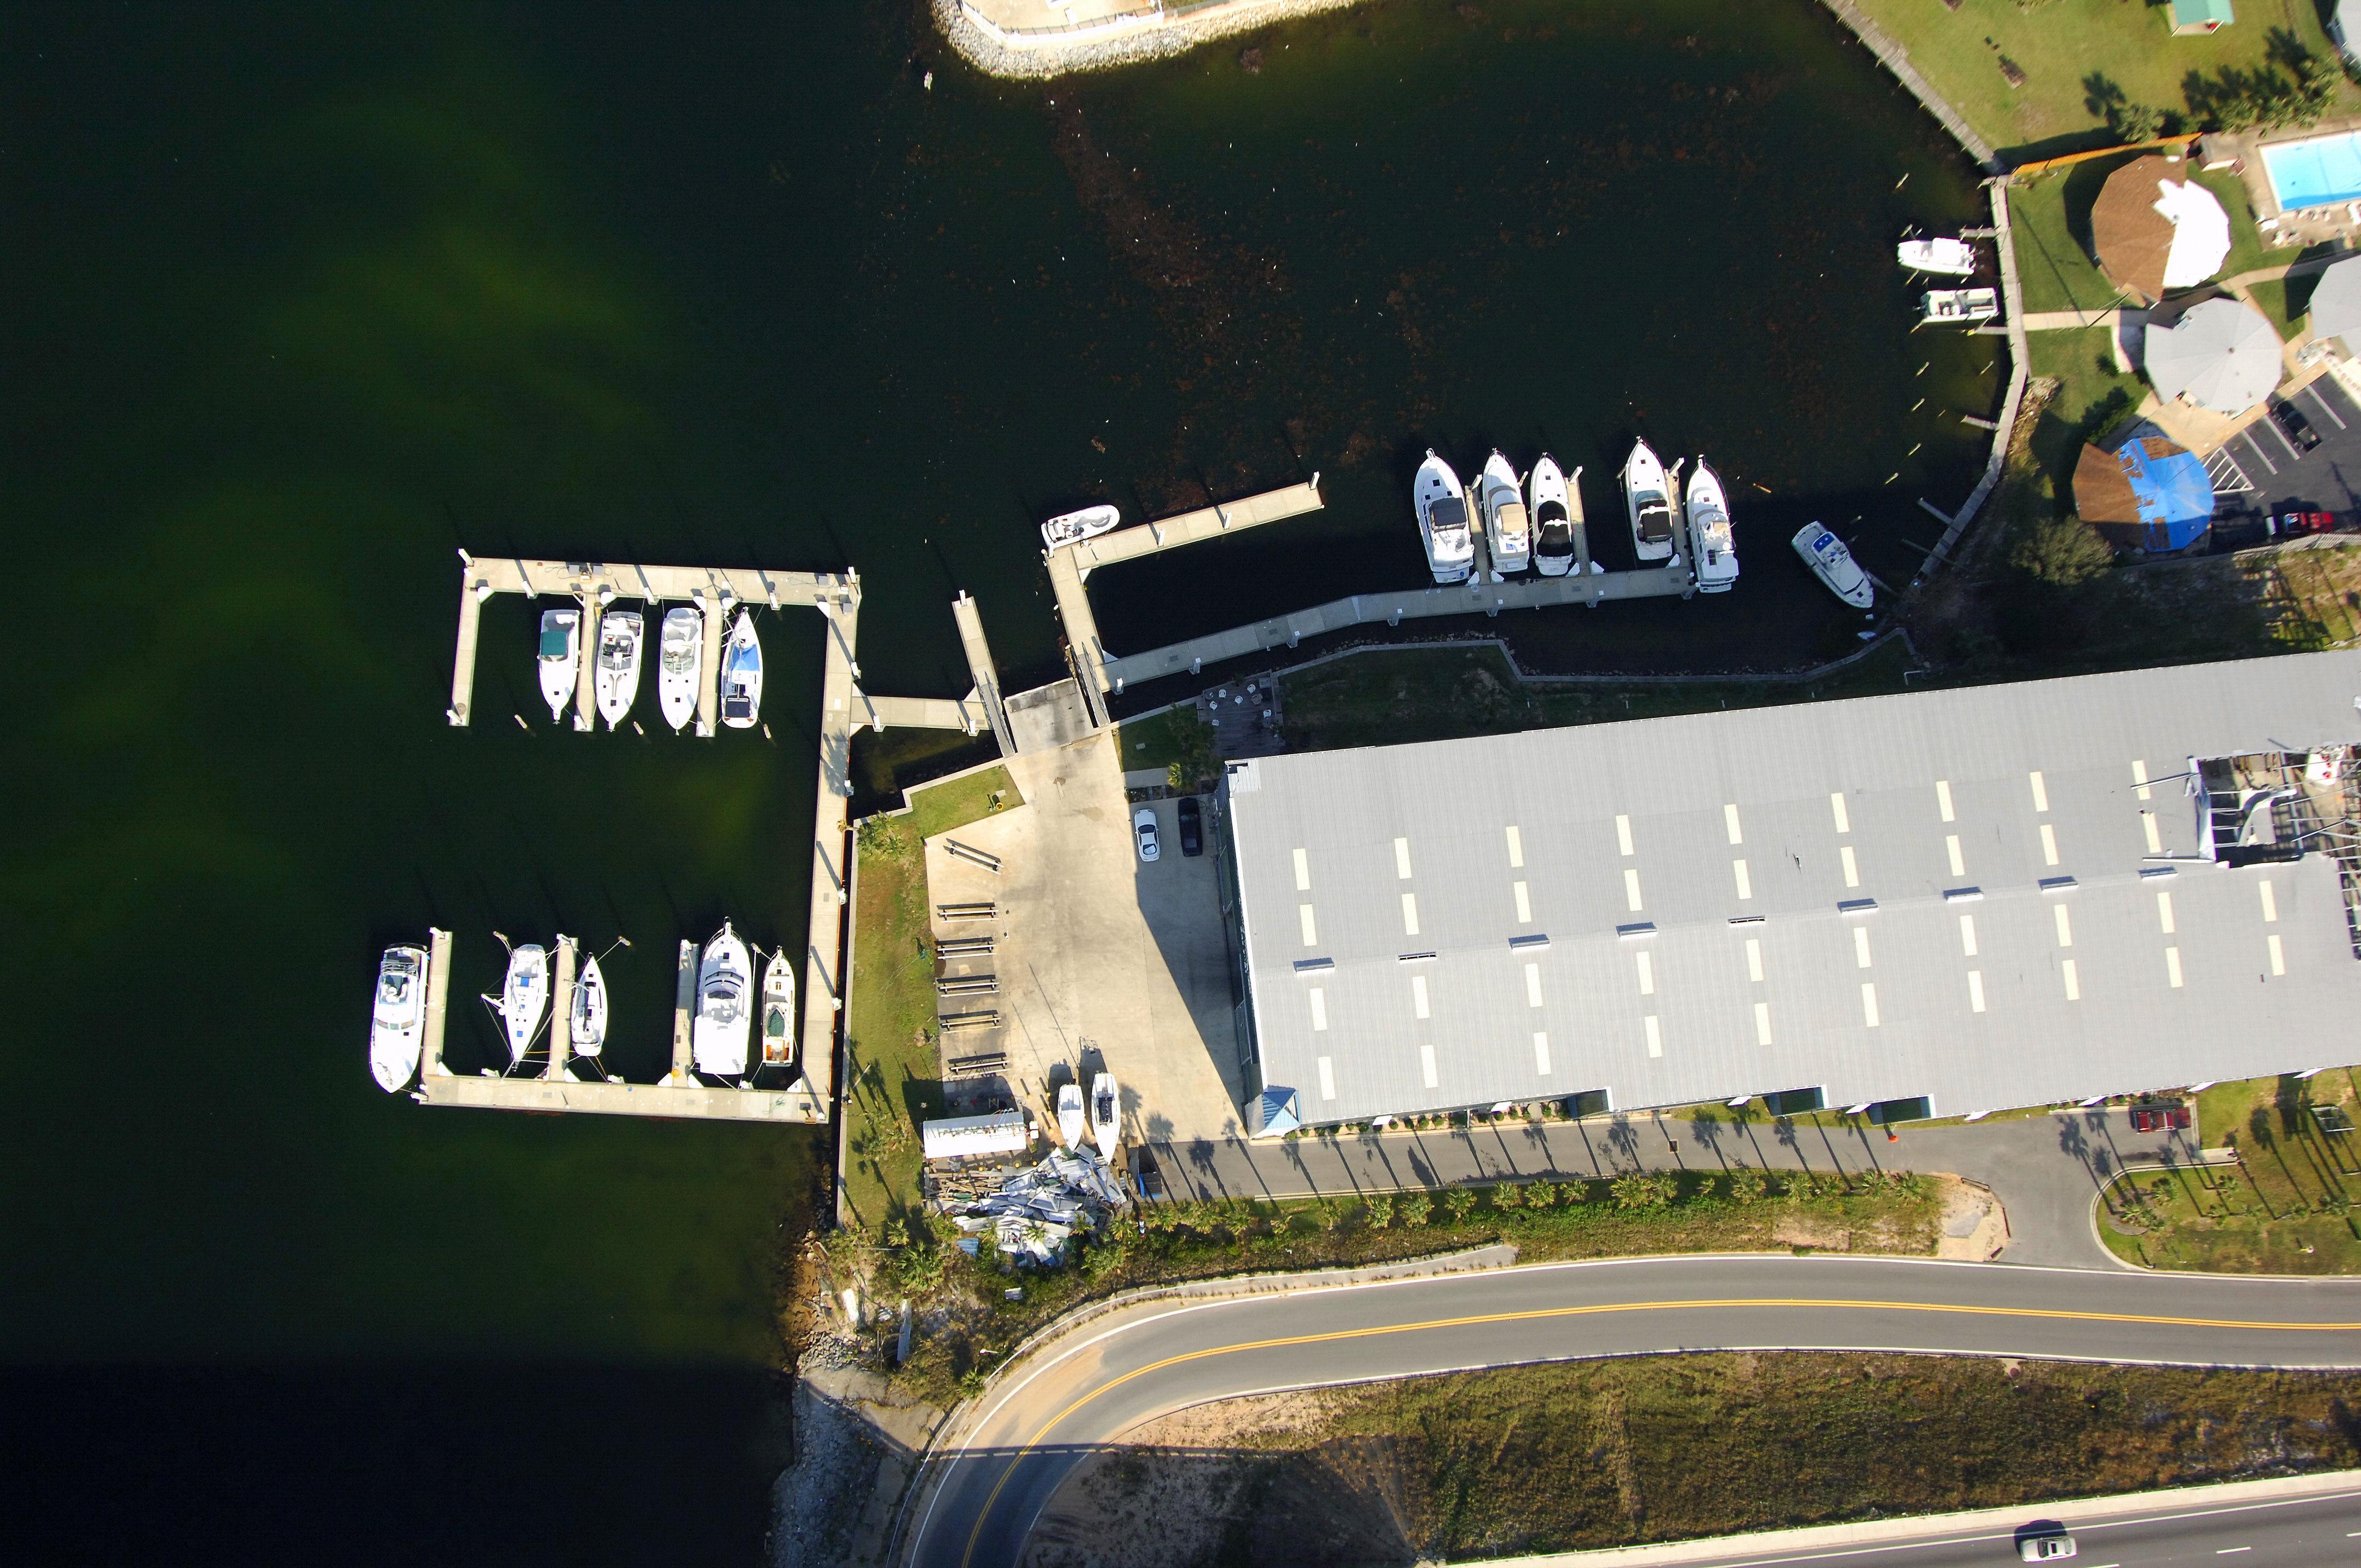 Brooks Bridge Marina Amp Dry Storage In Fort Walton Bch Fl